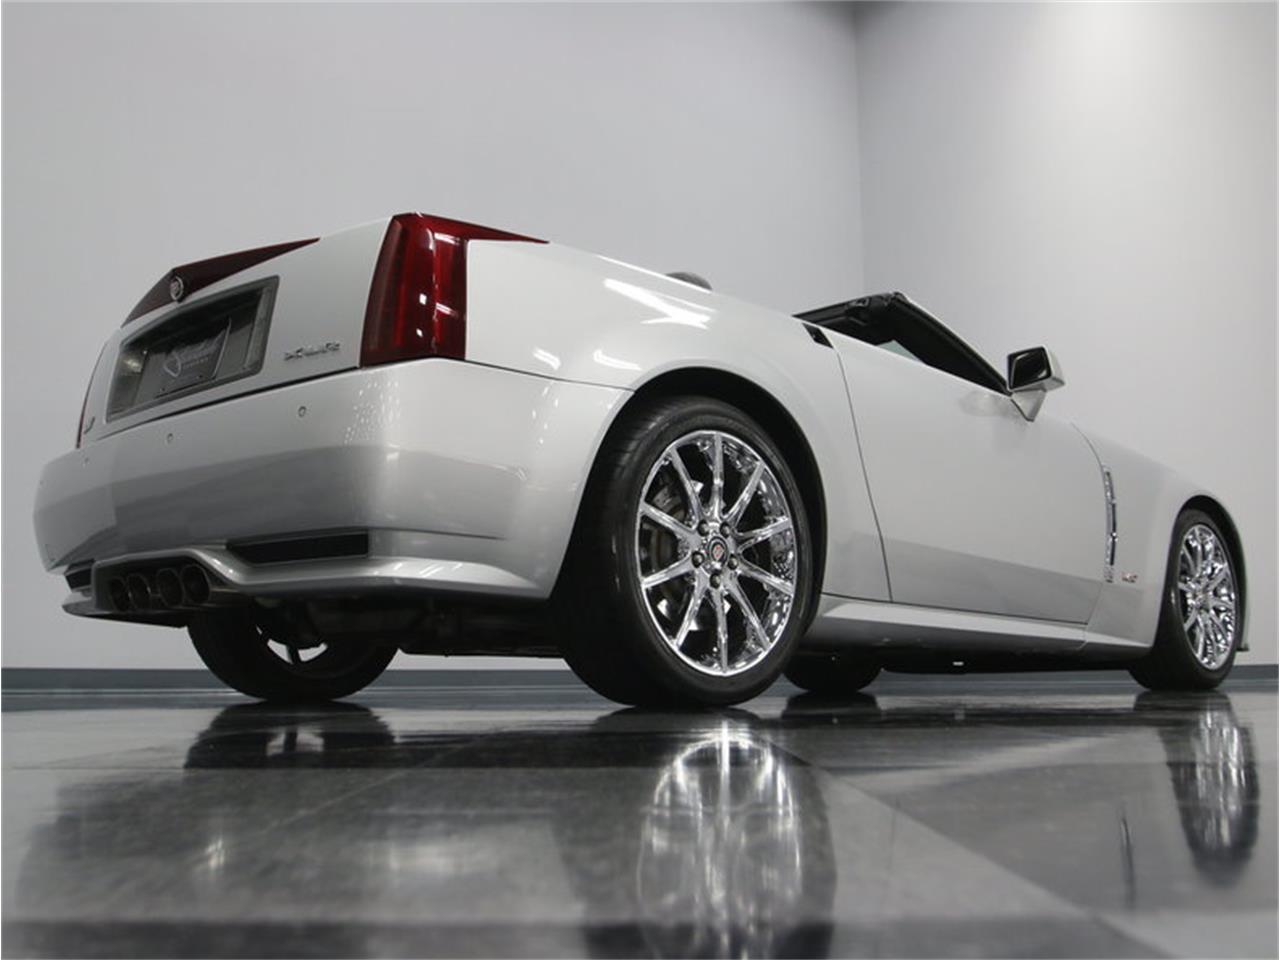 2009 Cadillac XLR-V for Sale   ClassicCars.com   CC-987935